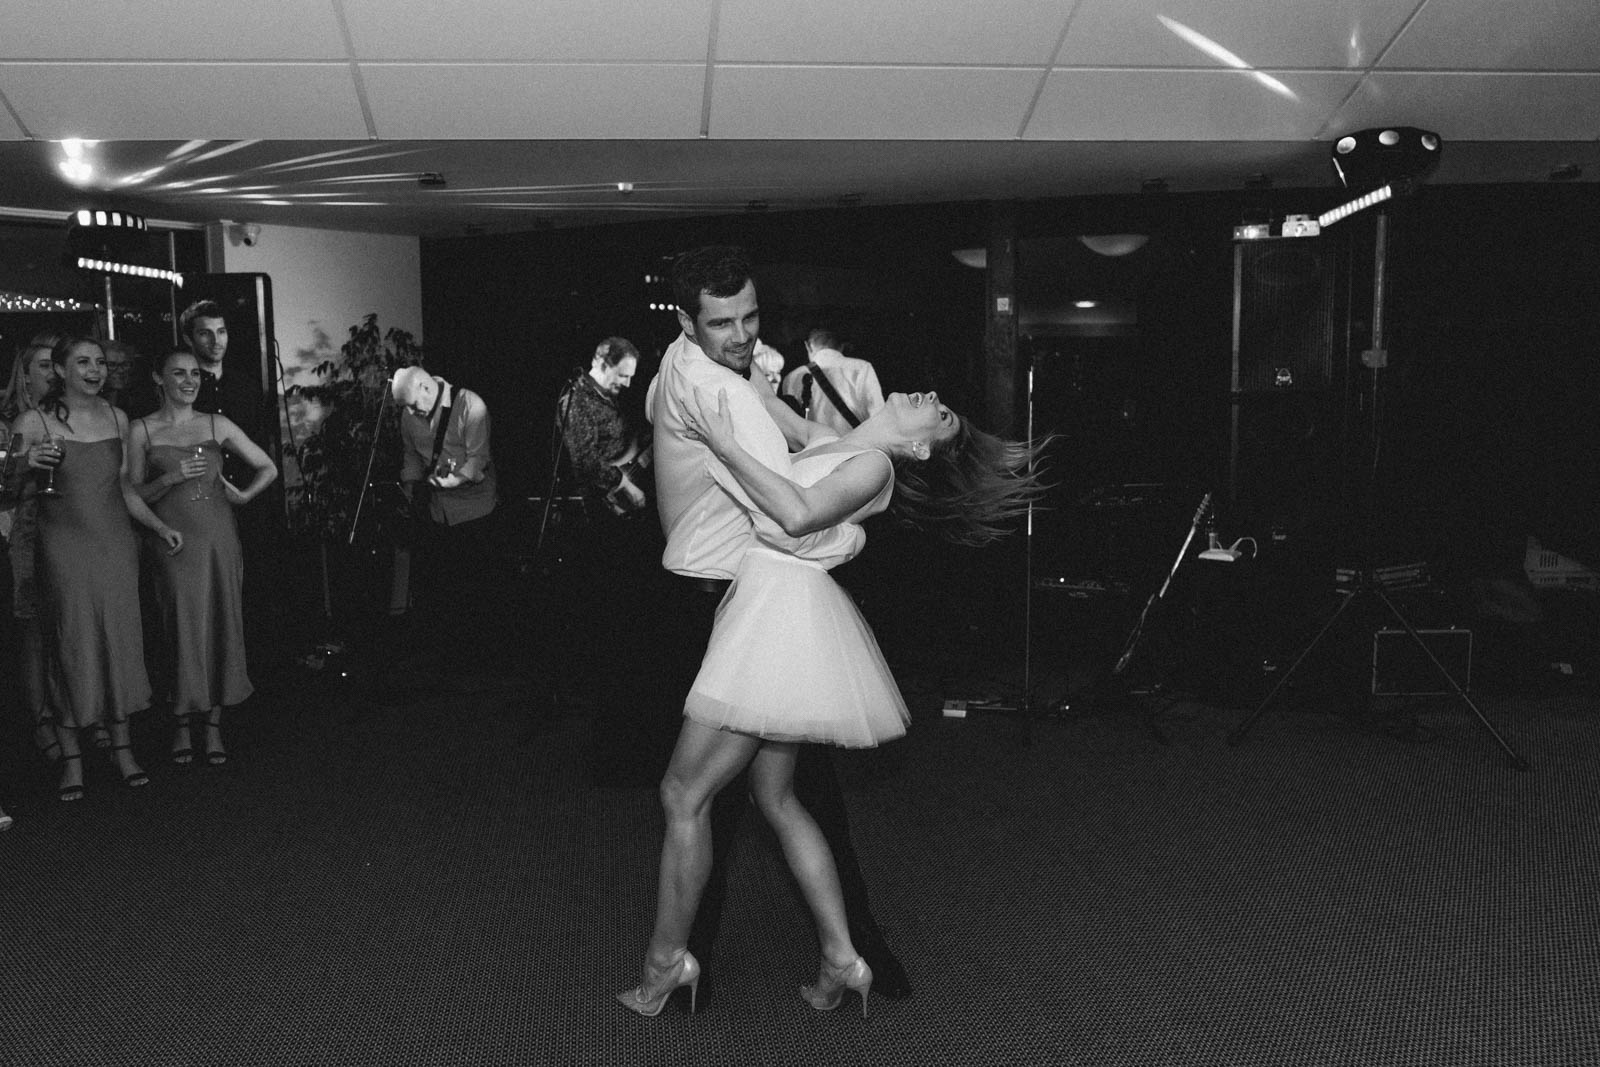 newfound-s-p-mt-maunganui-tauranga-wedding-photographer-2158-A9_09759